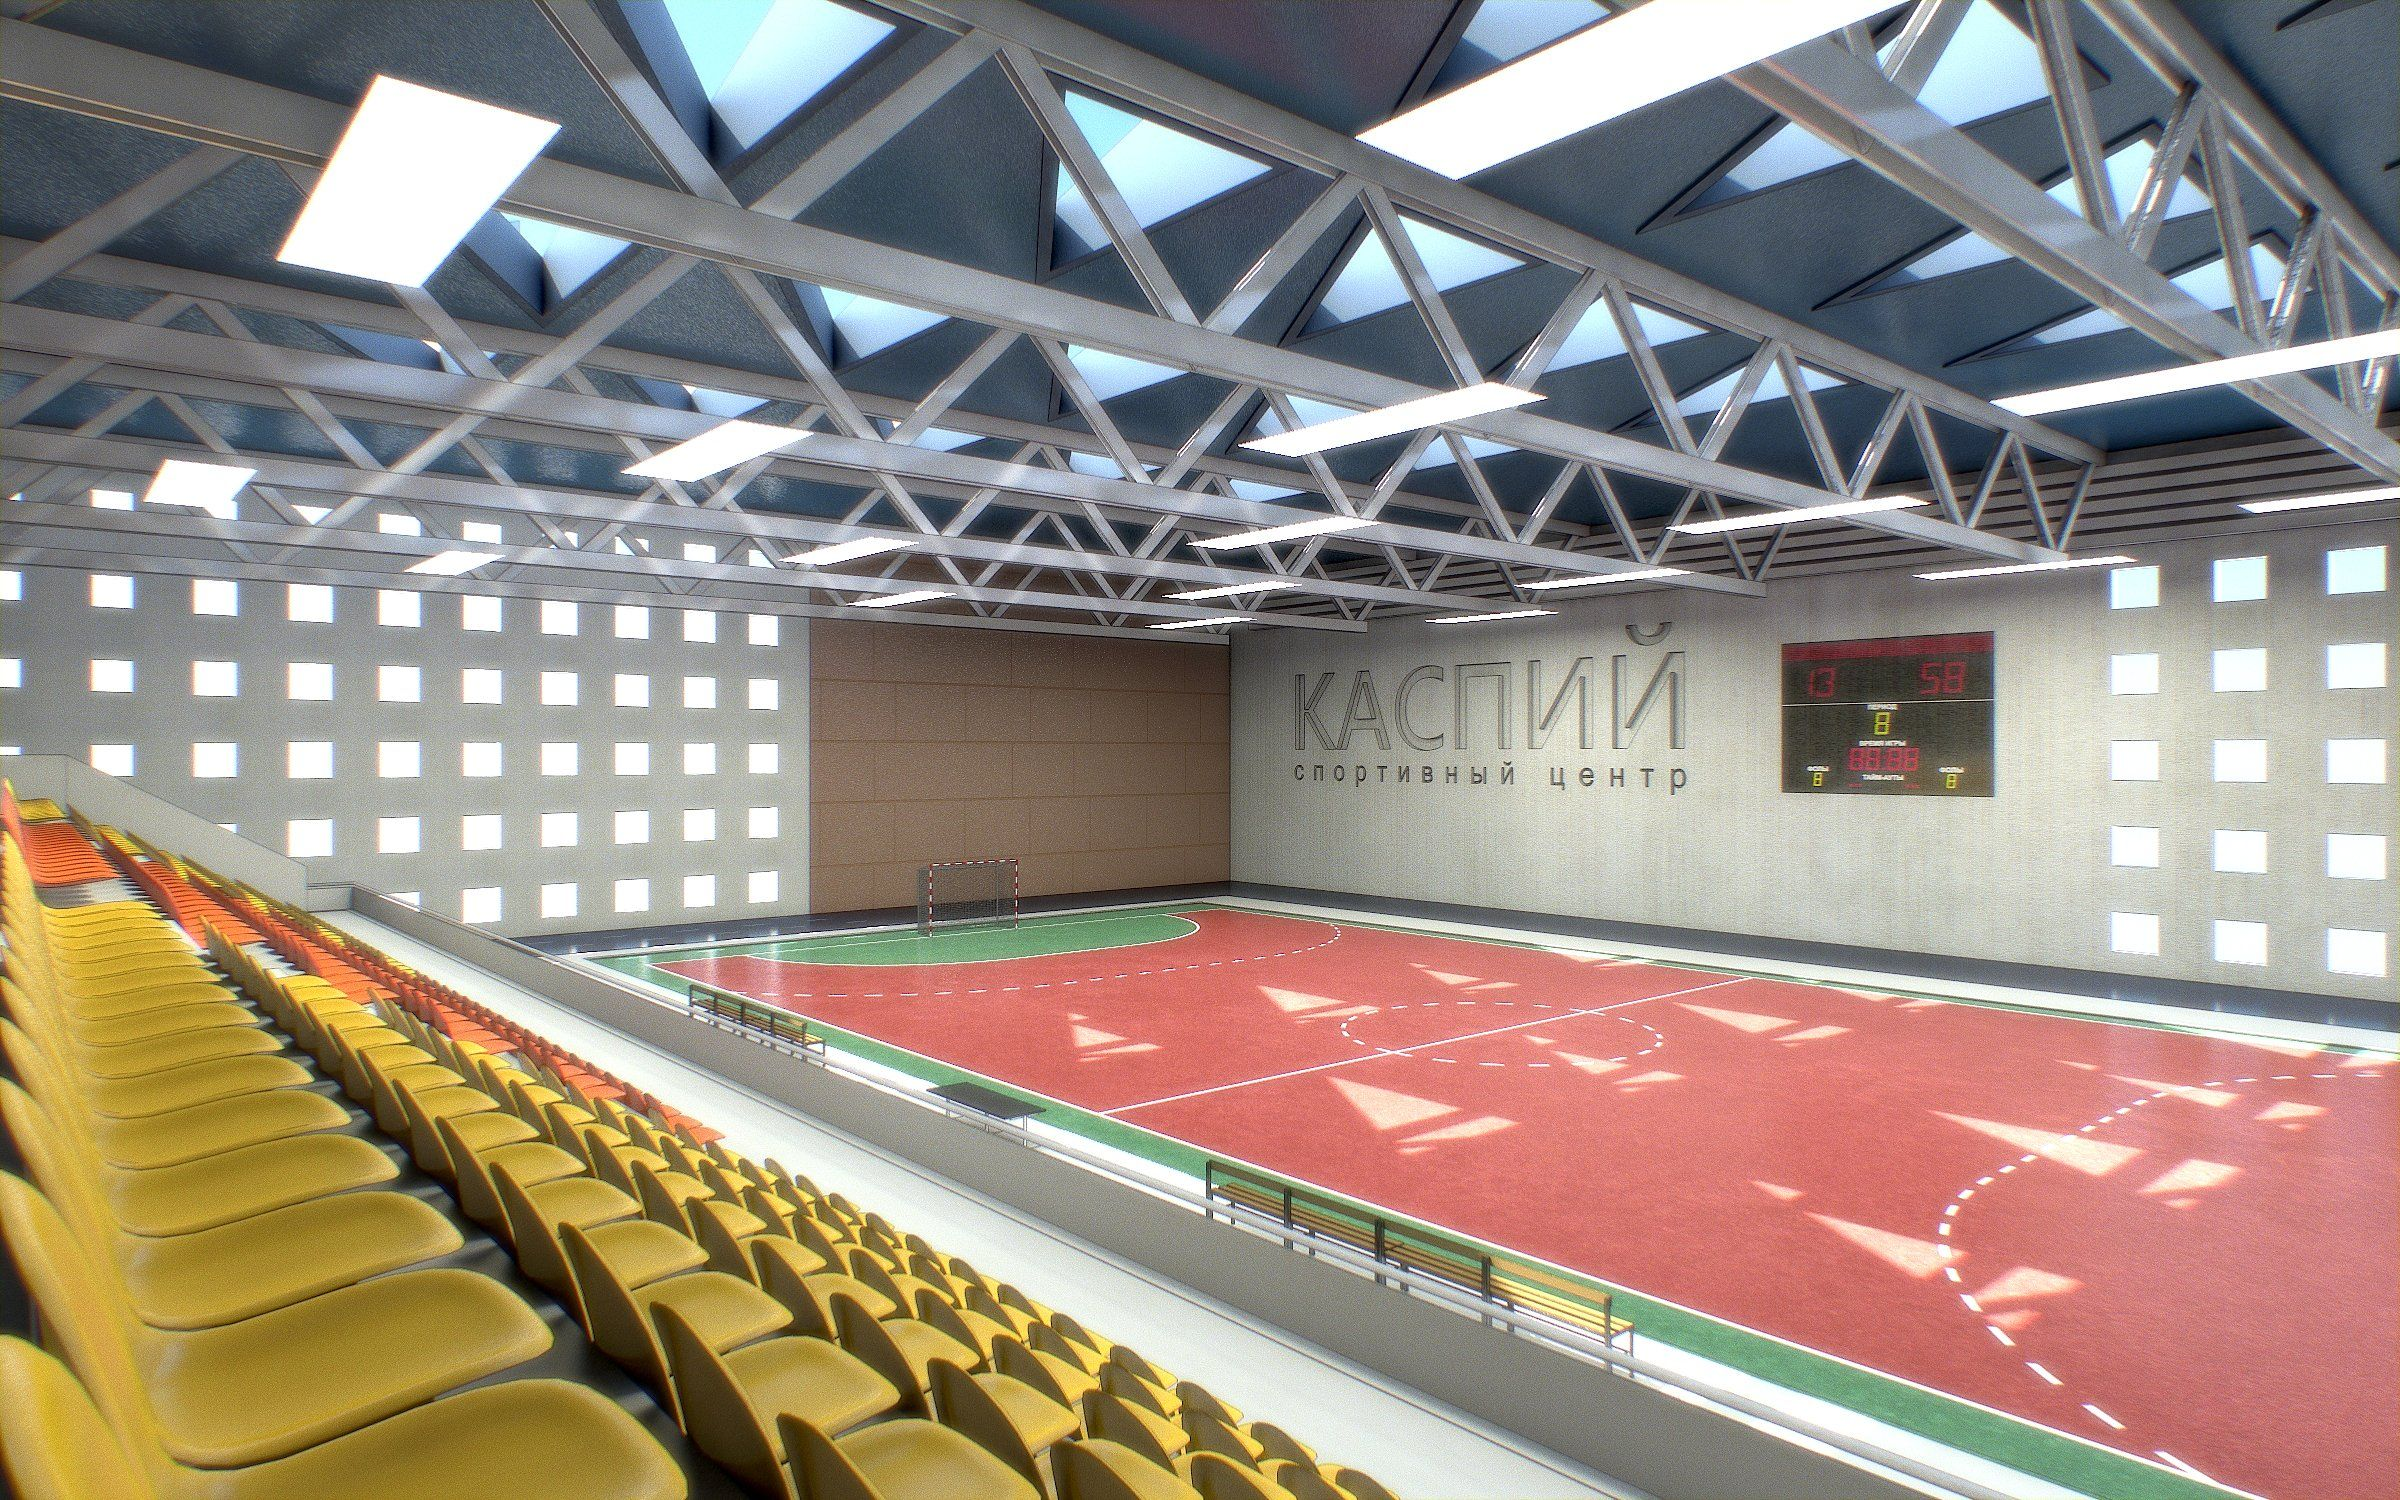 Gym Athletics Interior Gym interior, Architect, Branding